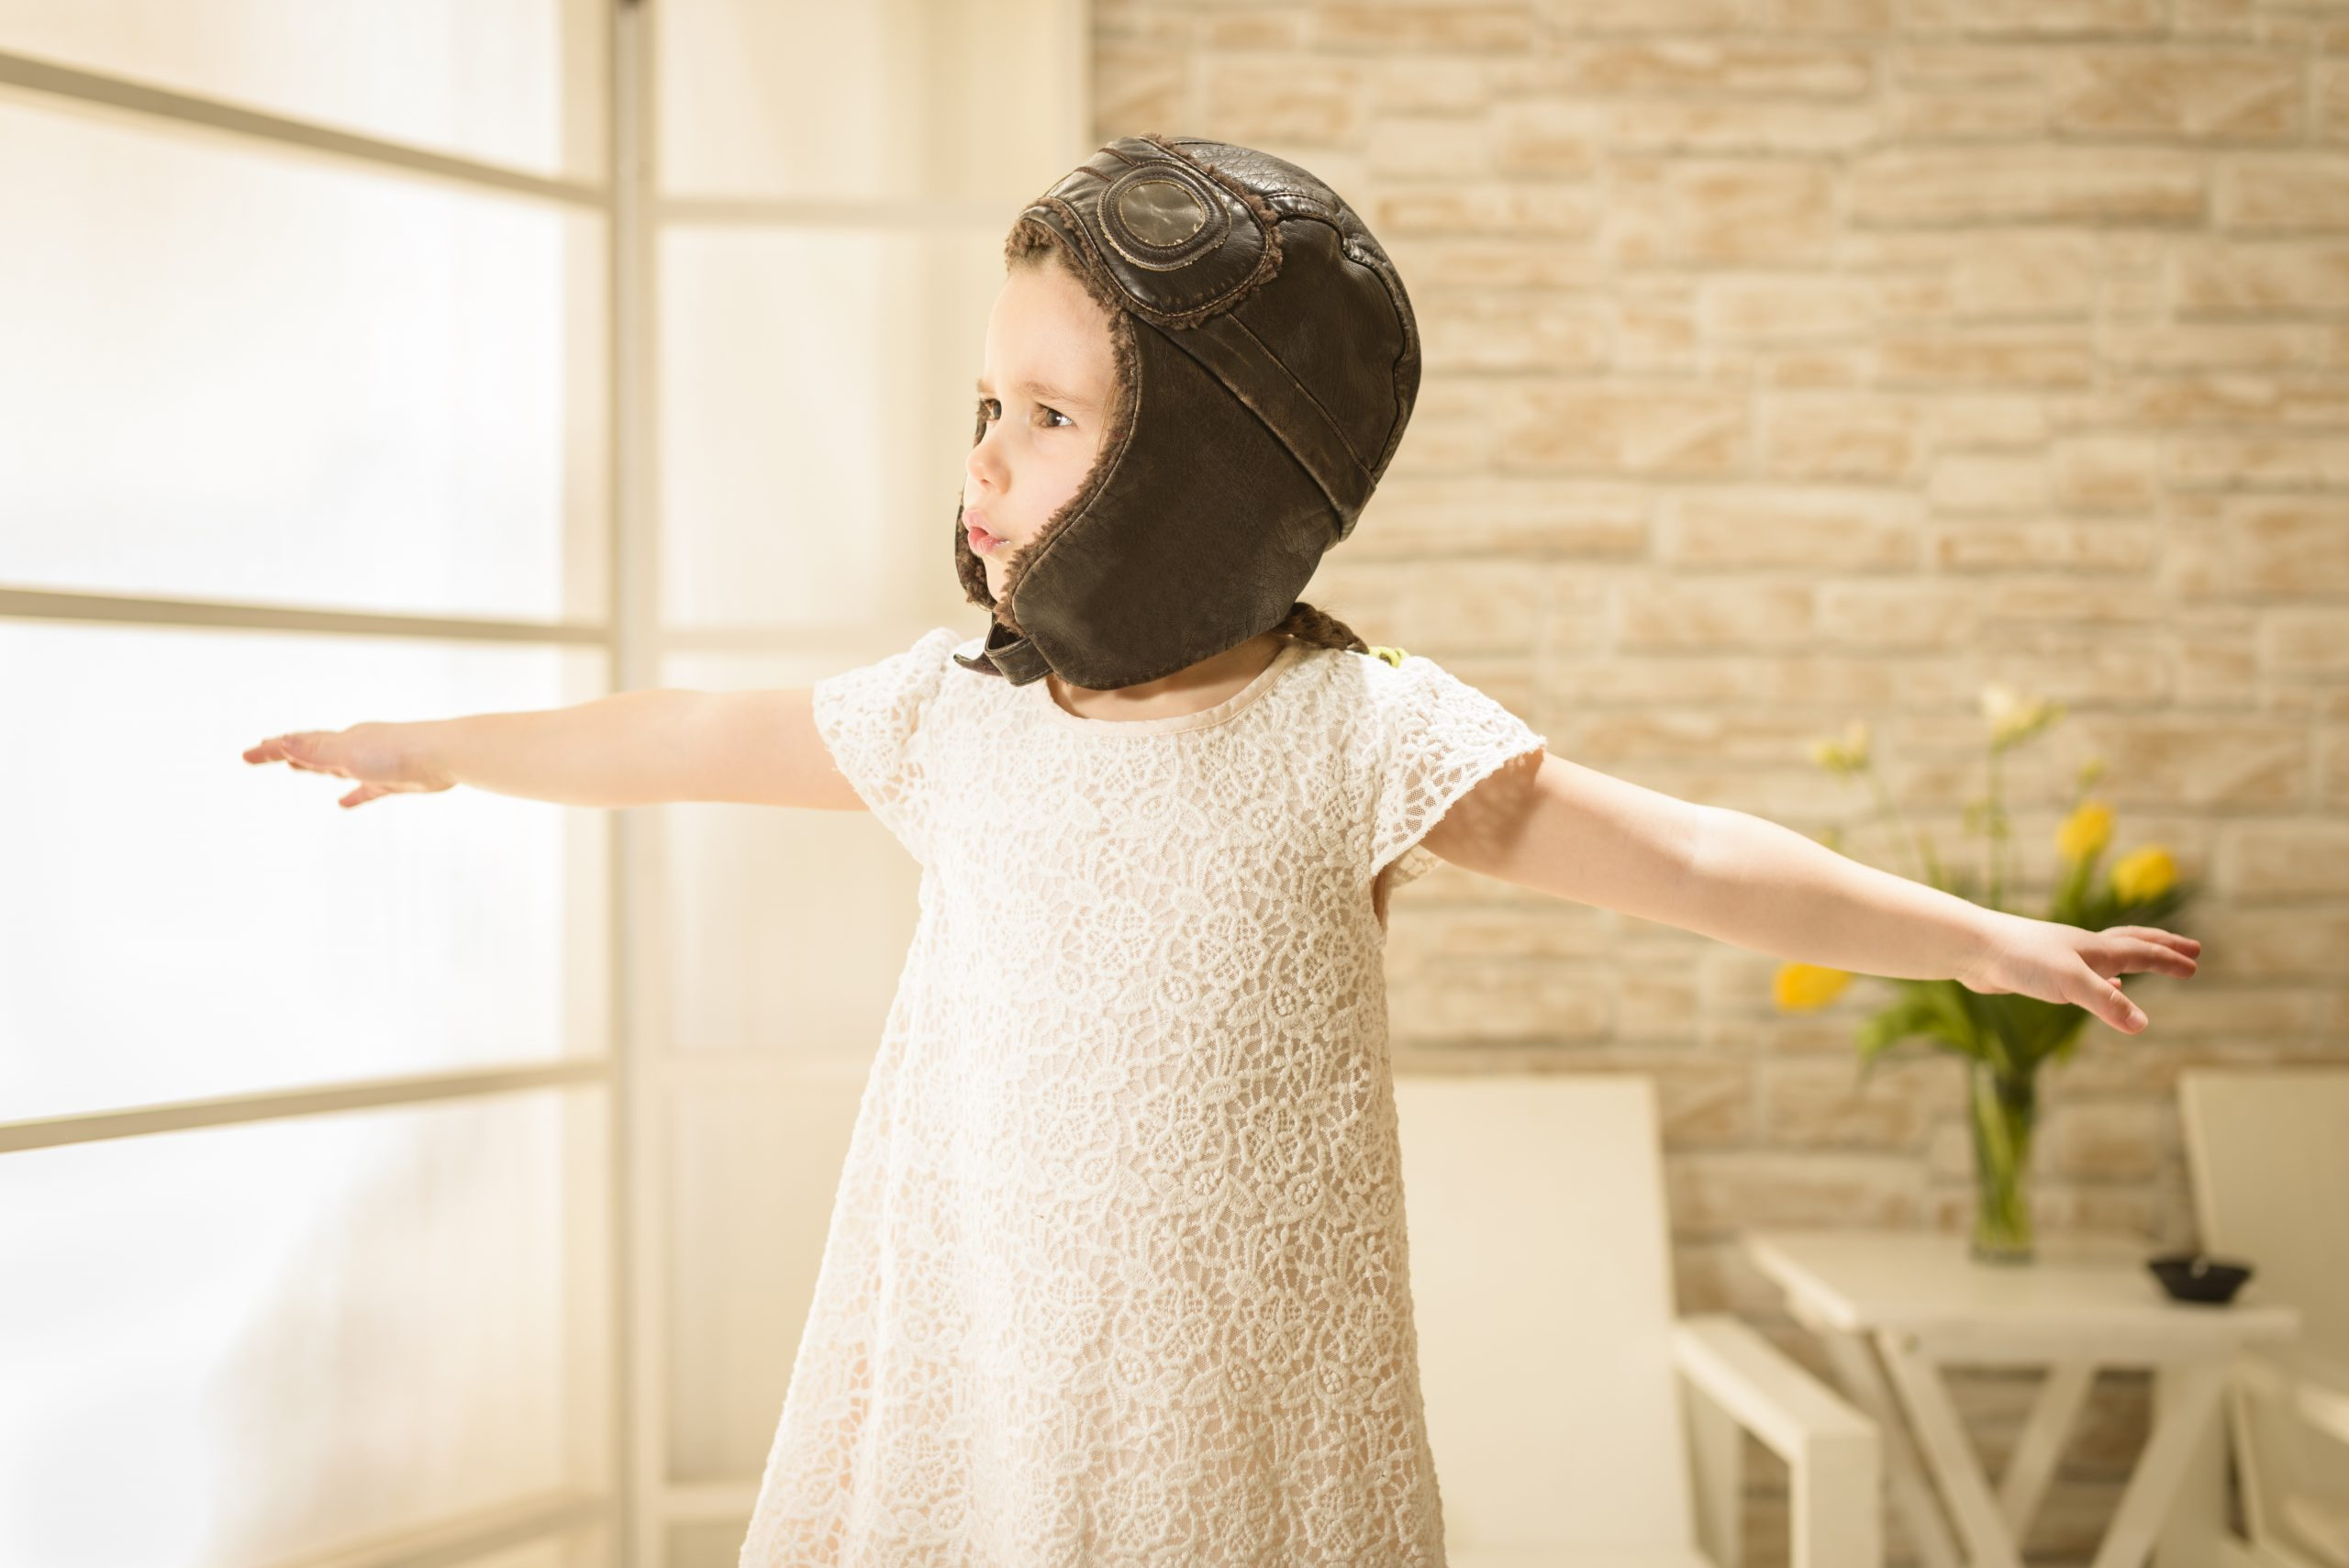 Small girl pretending to be a plane or a bird